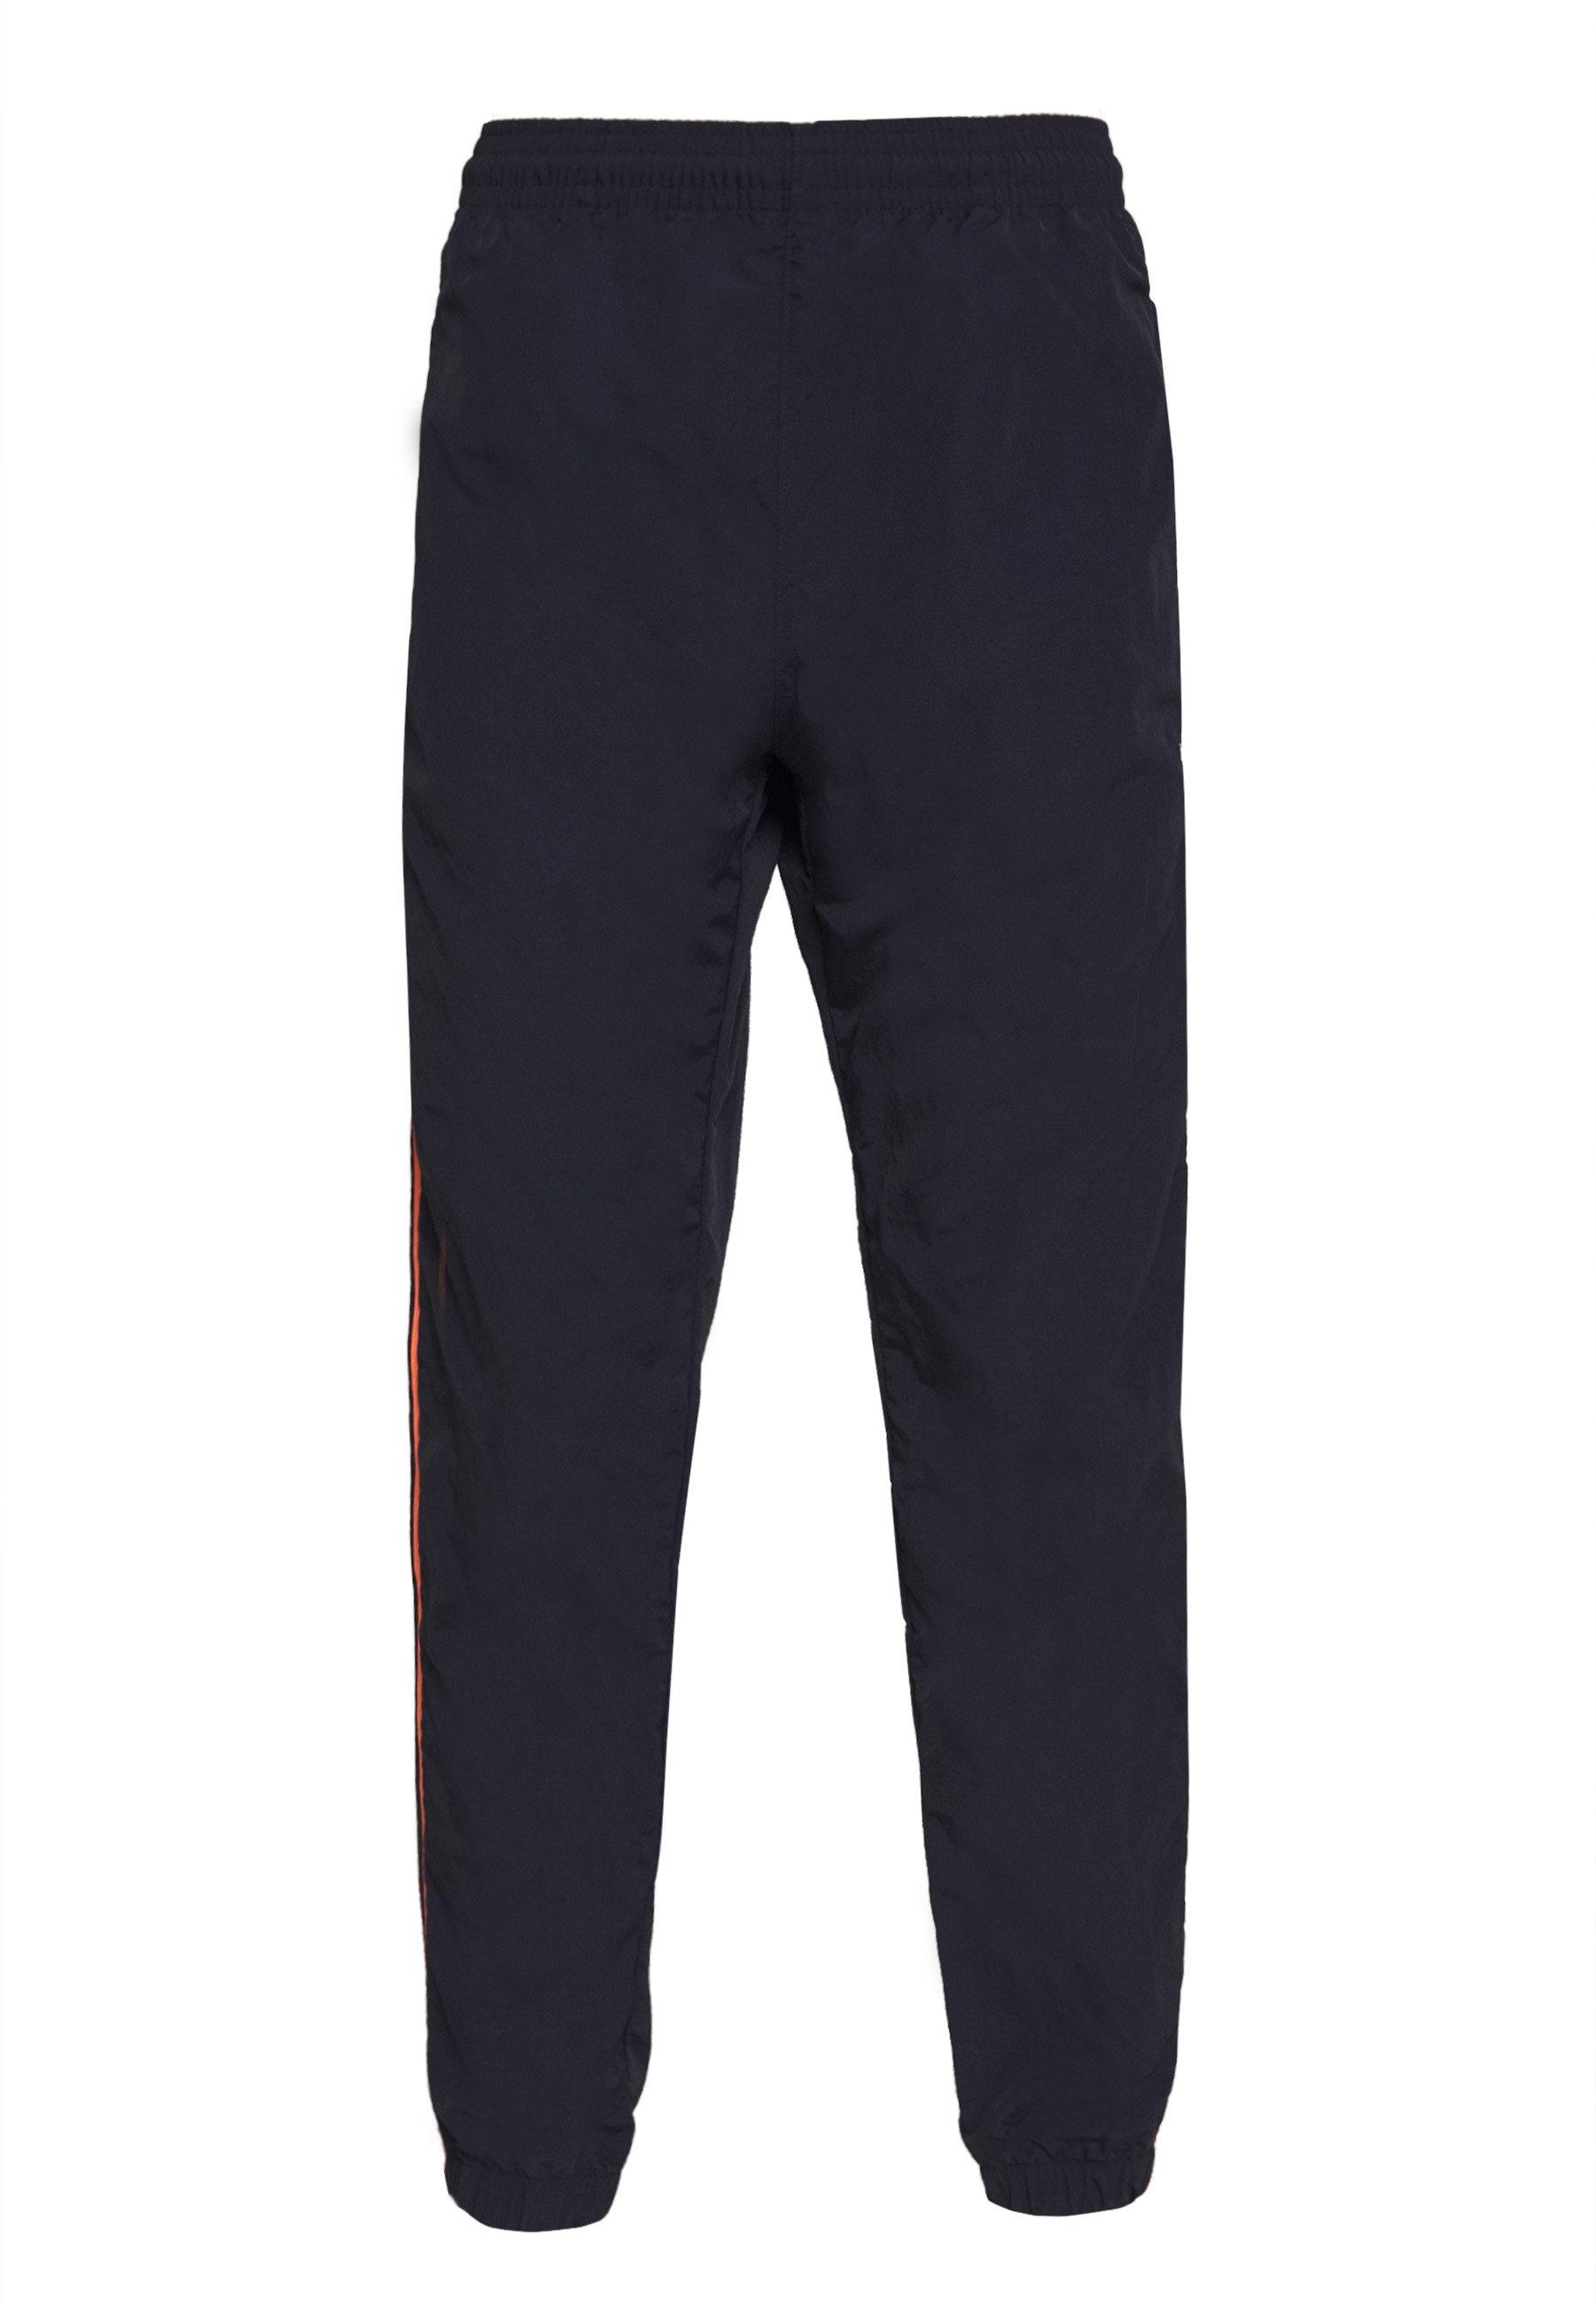 Adidas Originals Stripe - Pantaloni Sportivi Dark Blue zqI8i